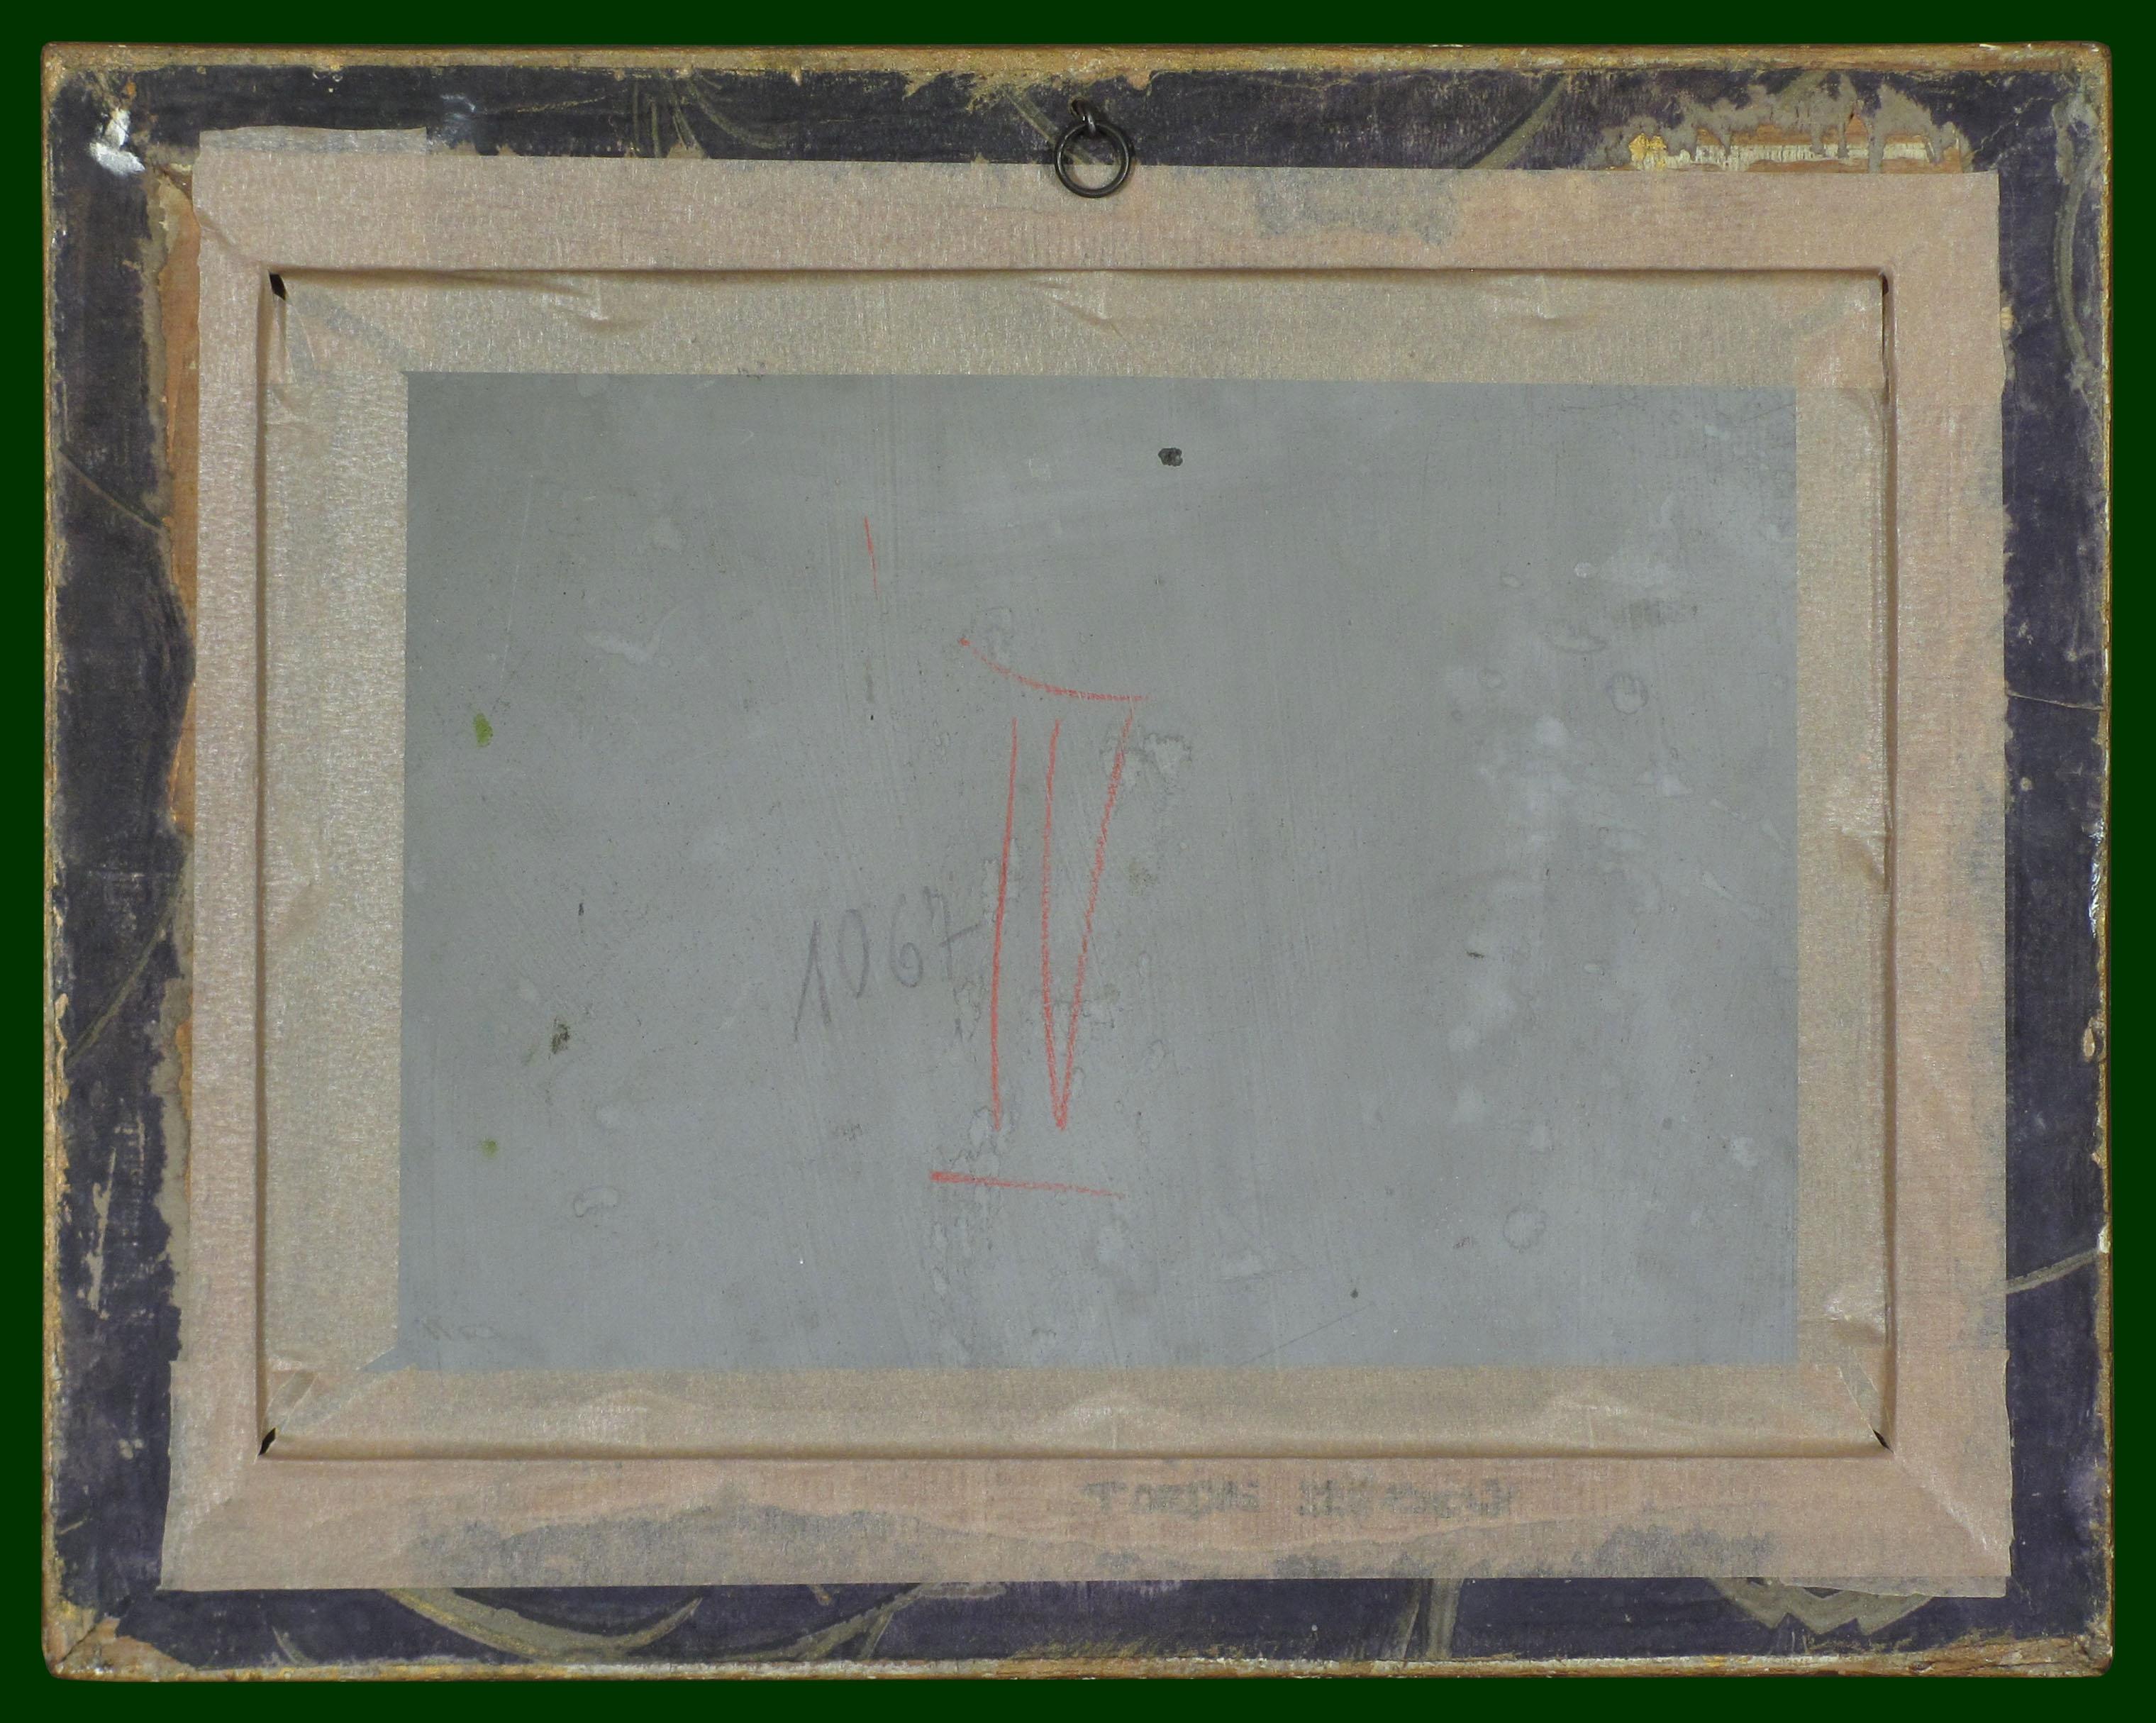 205-1h�t.jpg (3040�2429)